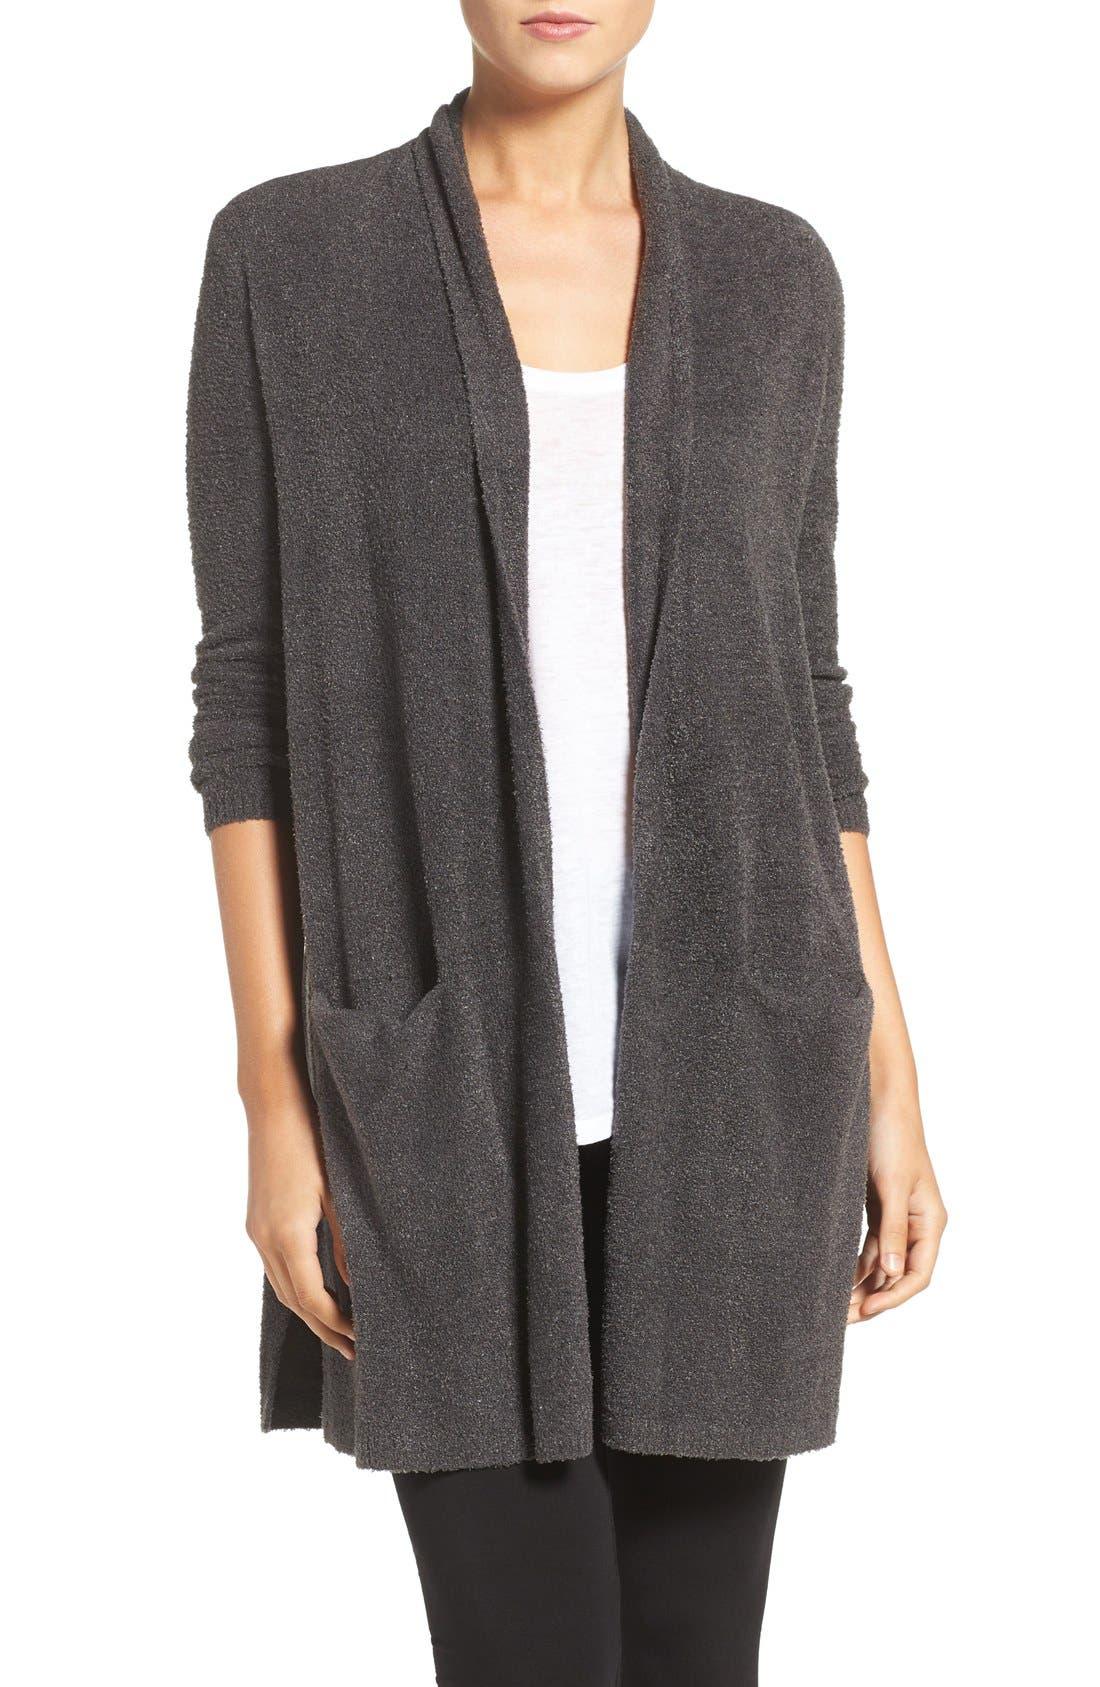 Main Image - Barefoot Dreams® CozyChic Lite® Long Essential Cardigan